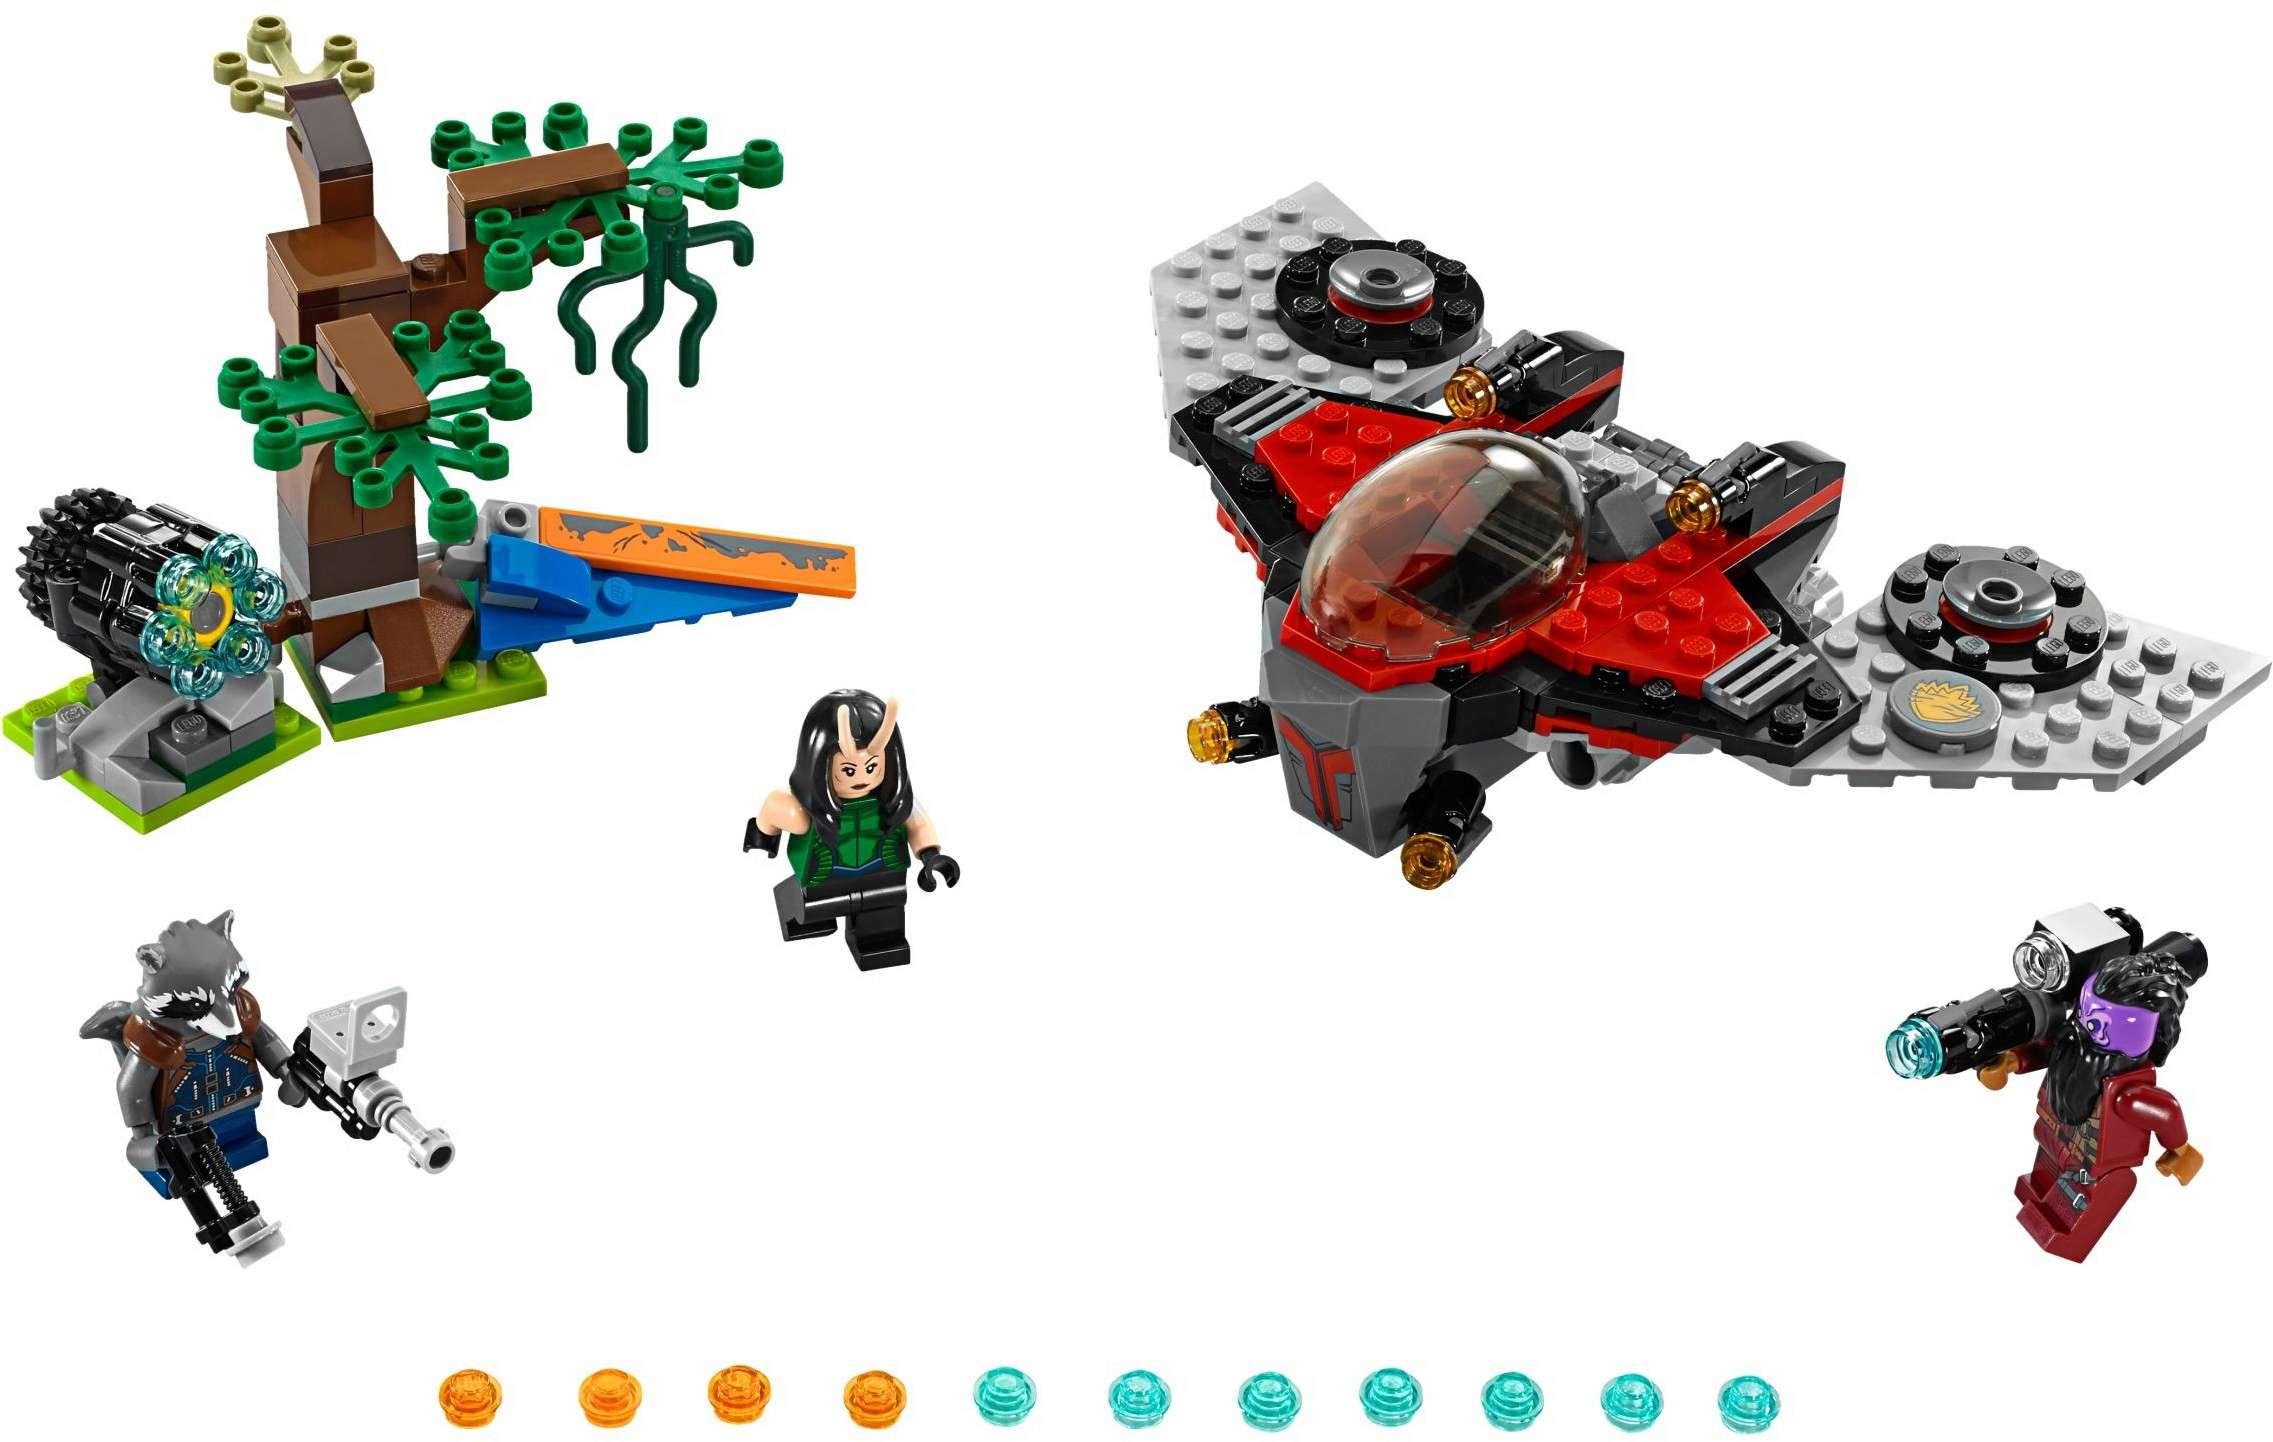 [LEGO] Les Gardiens de la Galaxie Vol. 2 : les ensembles du film 76079-10